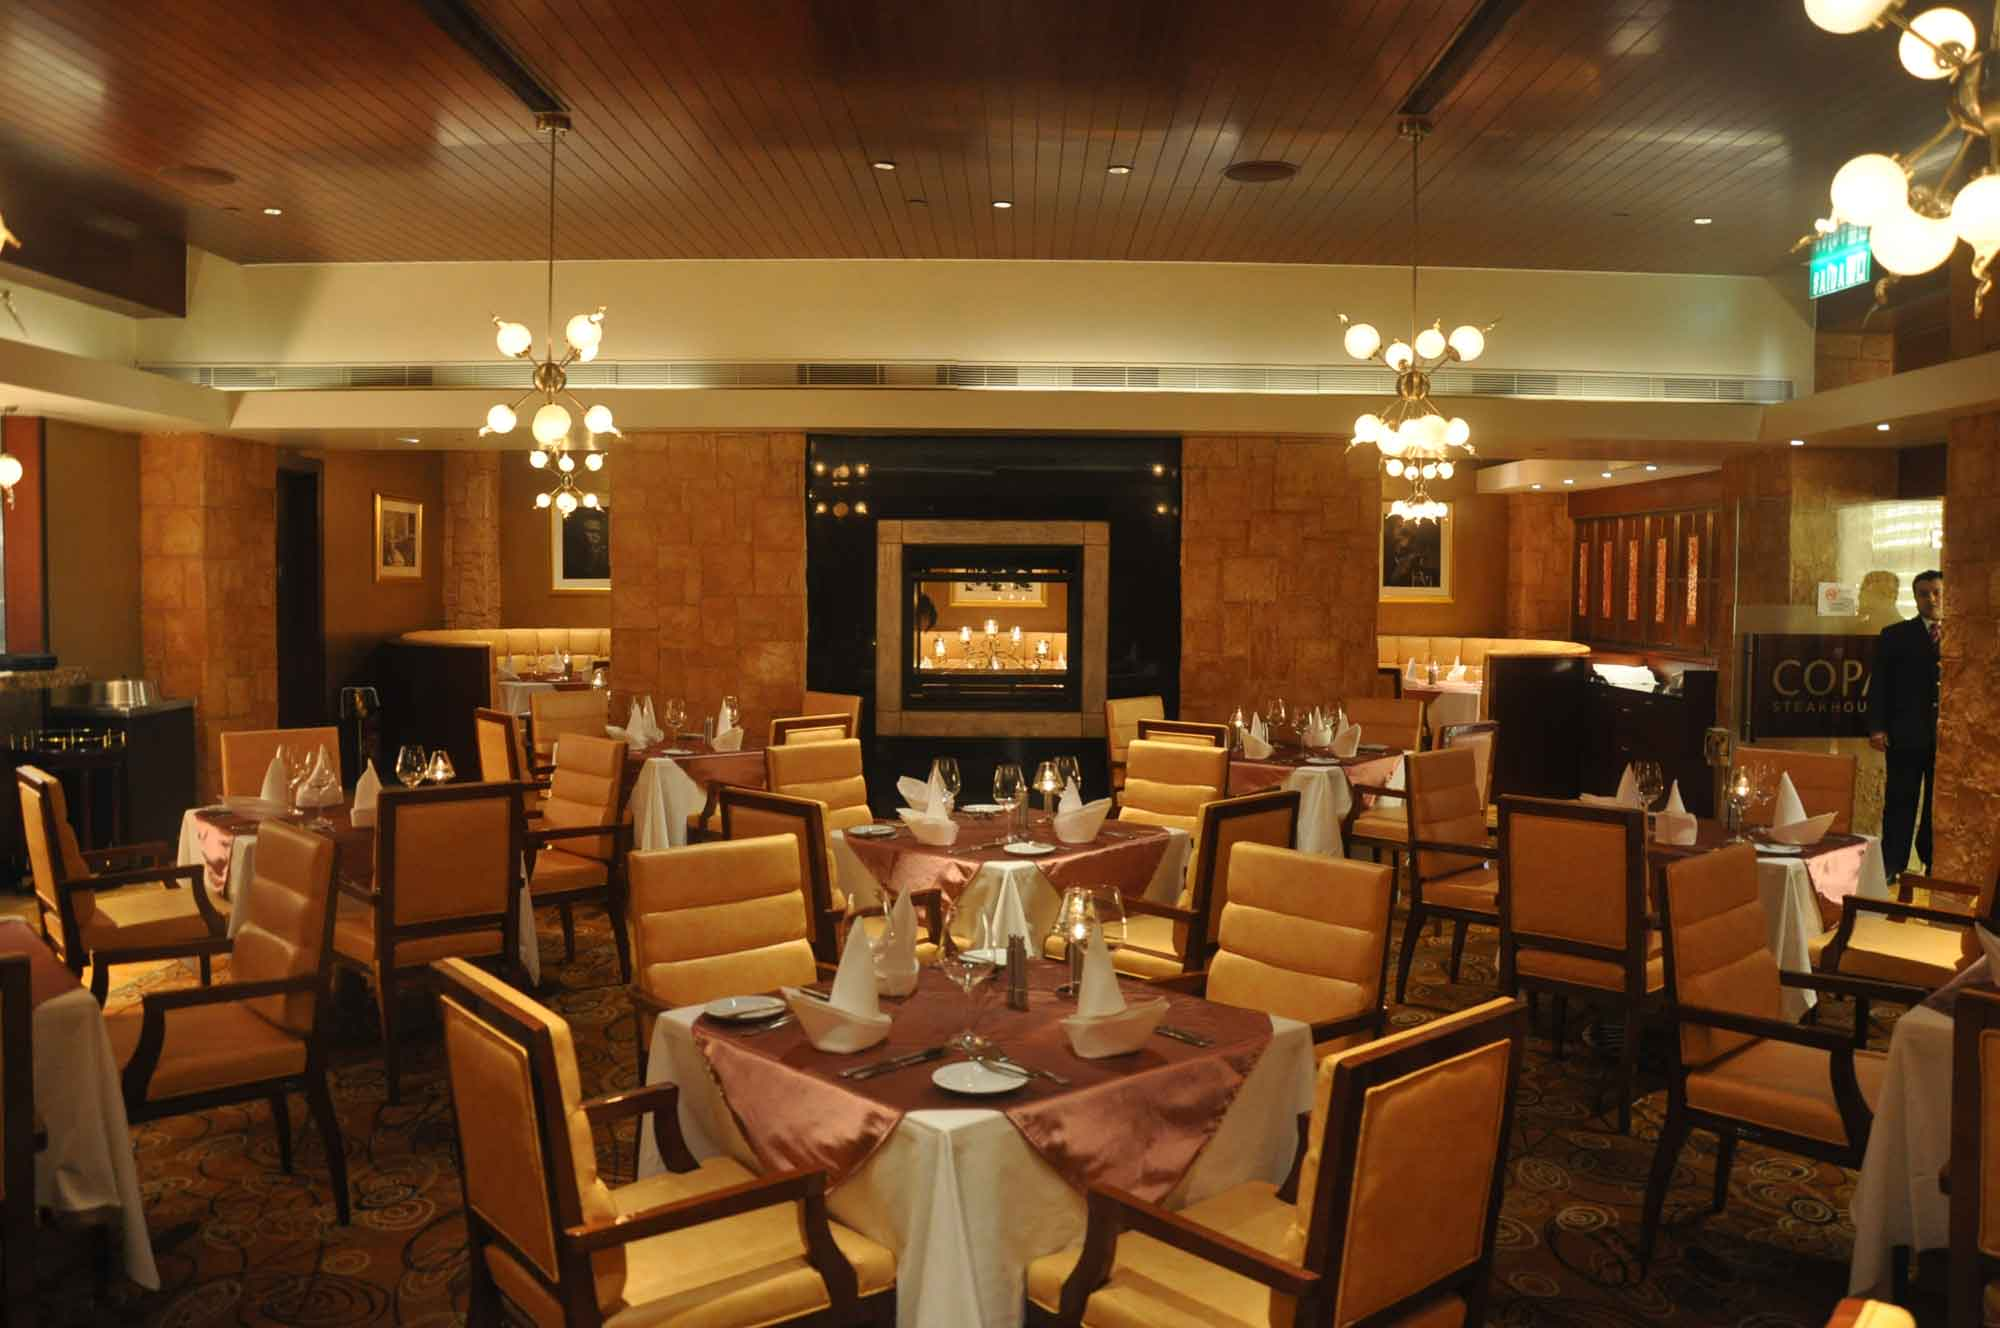 Copa Steakhouse indoor seating